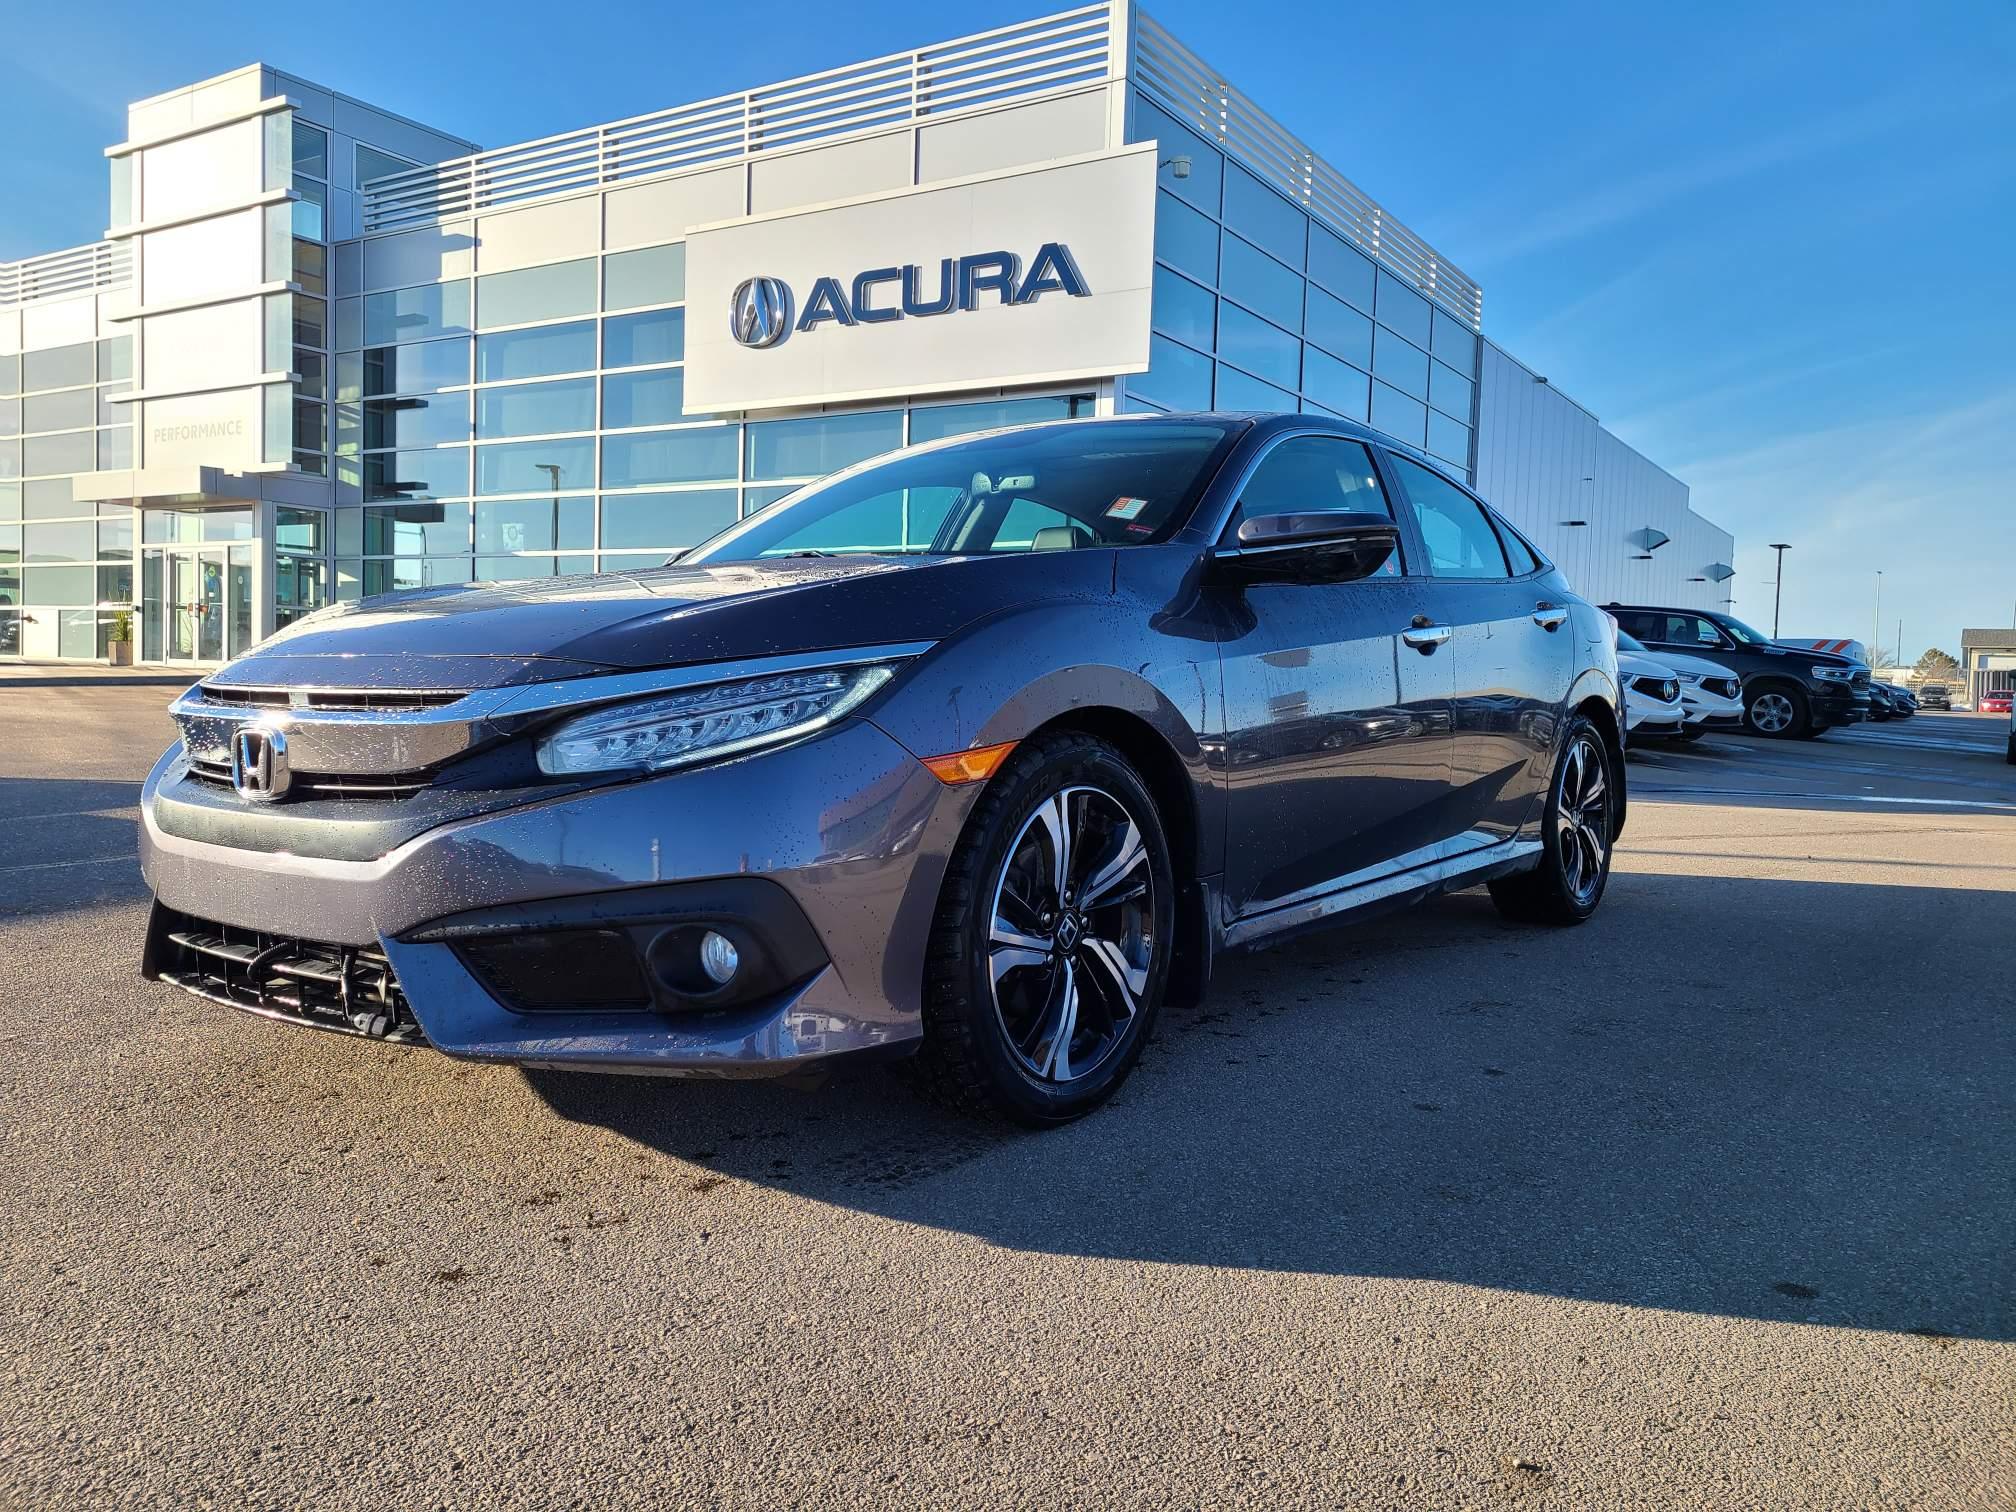 used 2018 Honda Civic car, priced at $20,850